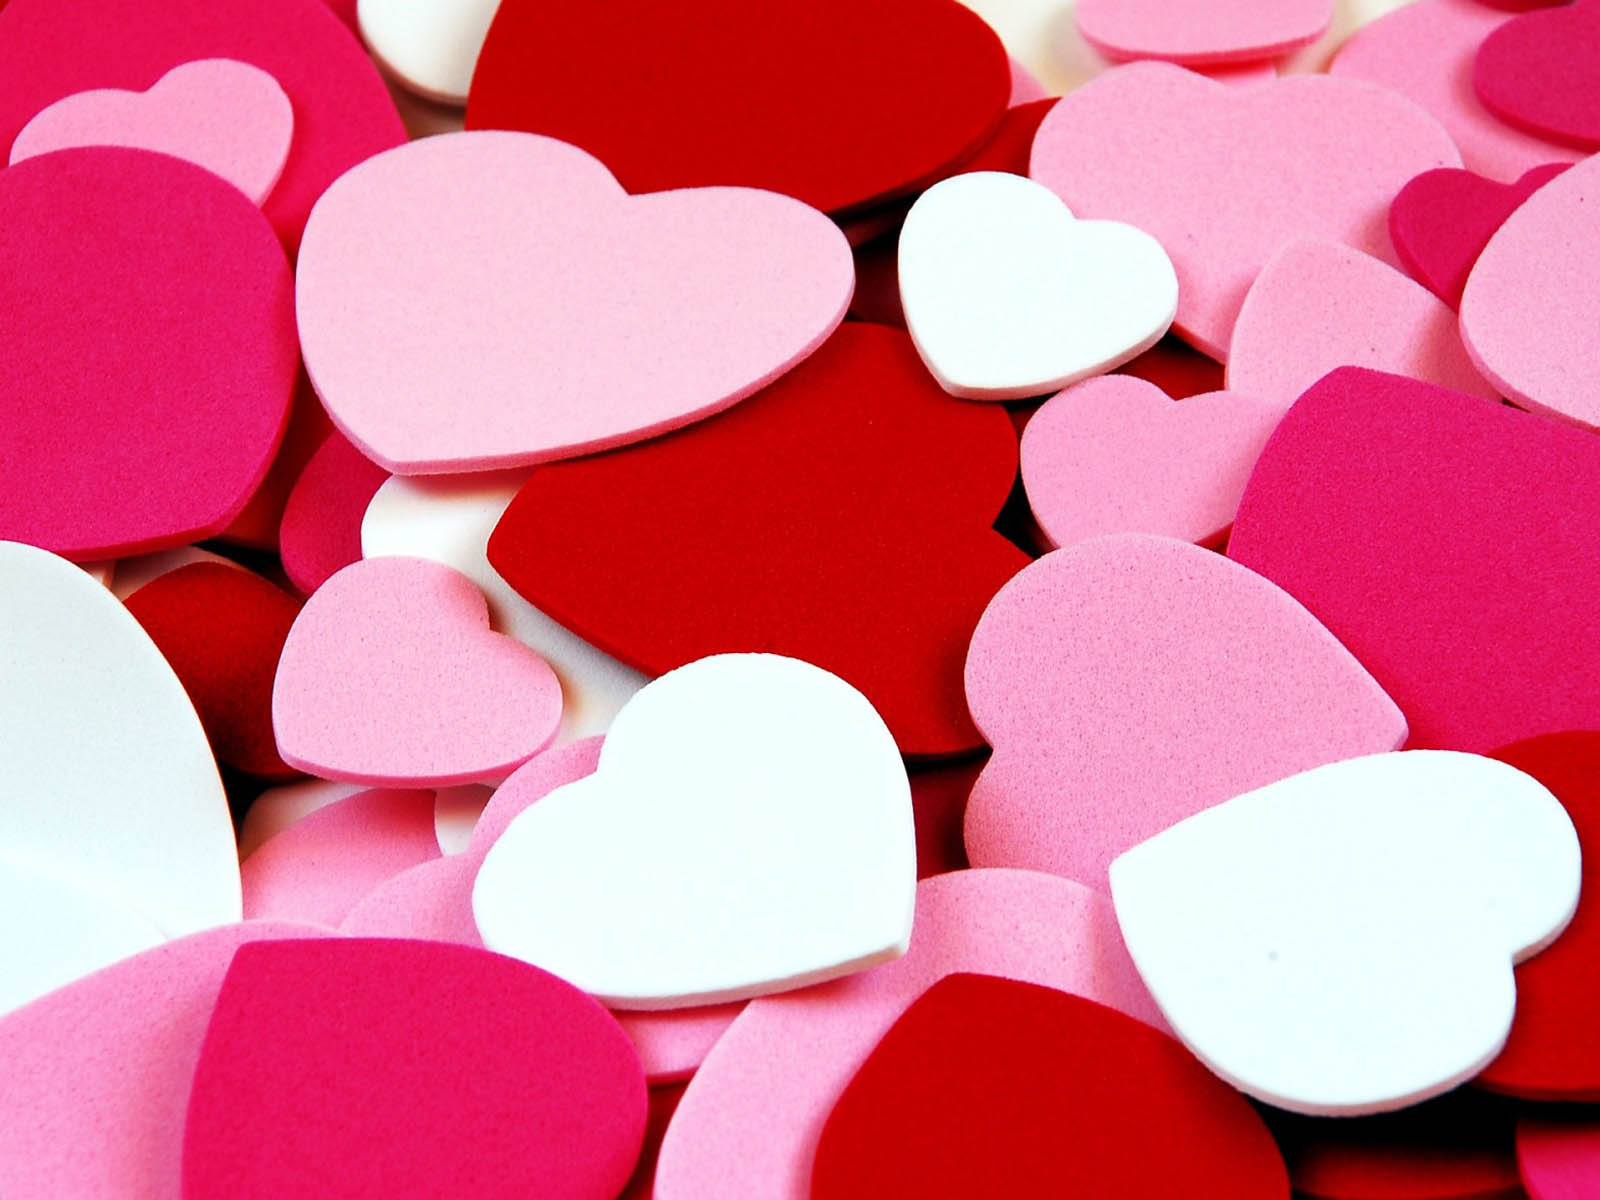 wallpaper: Heart Love Wallpapers